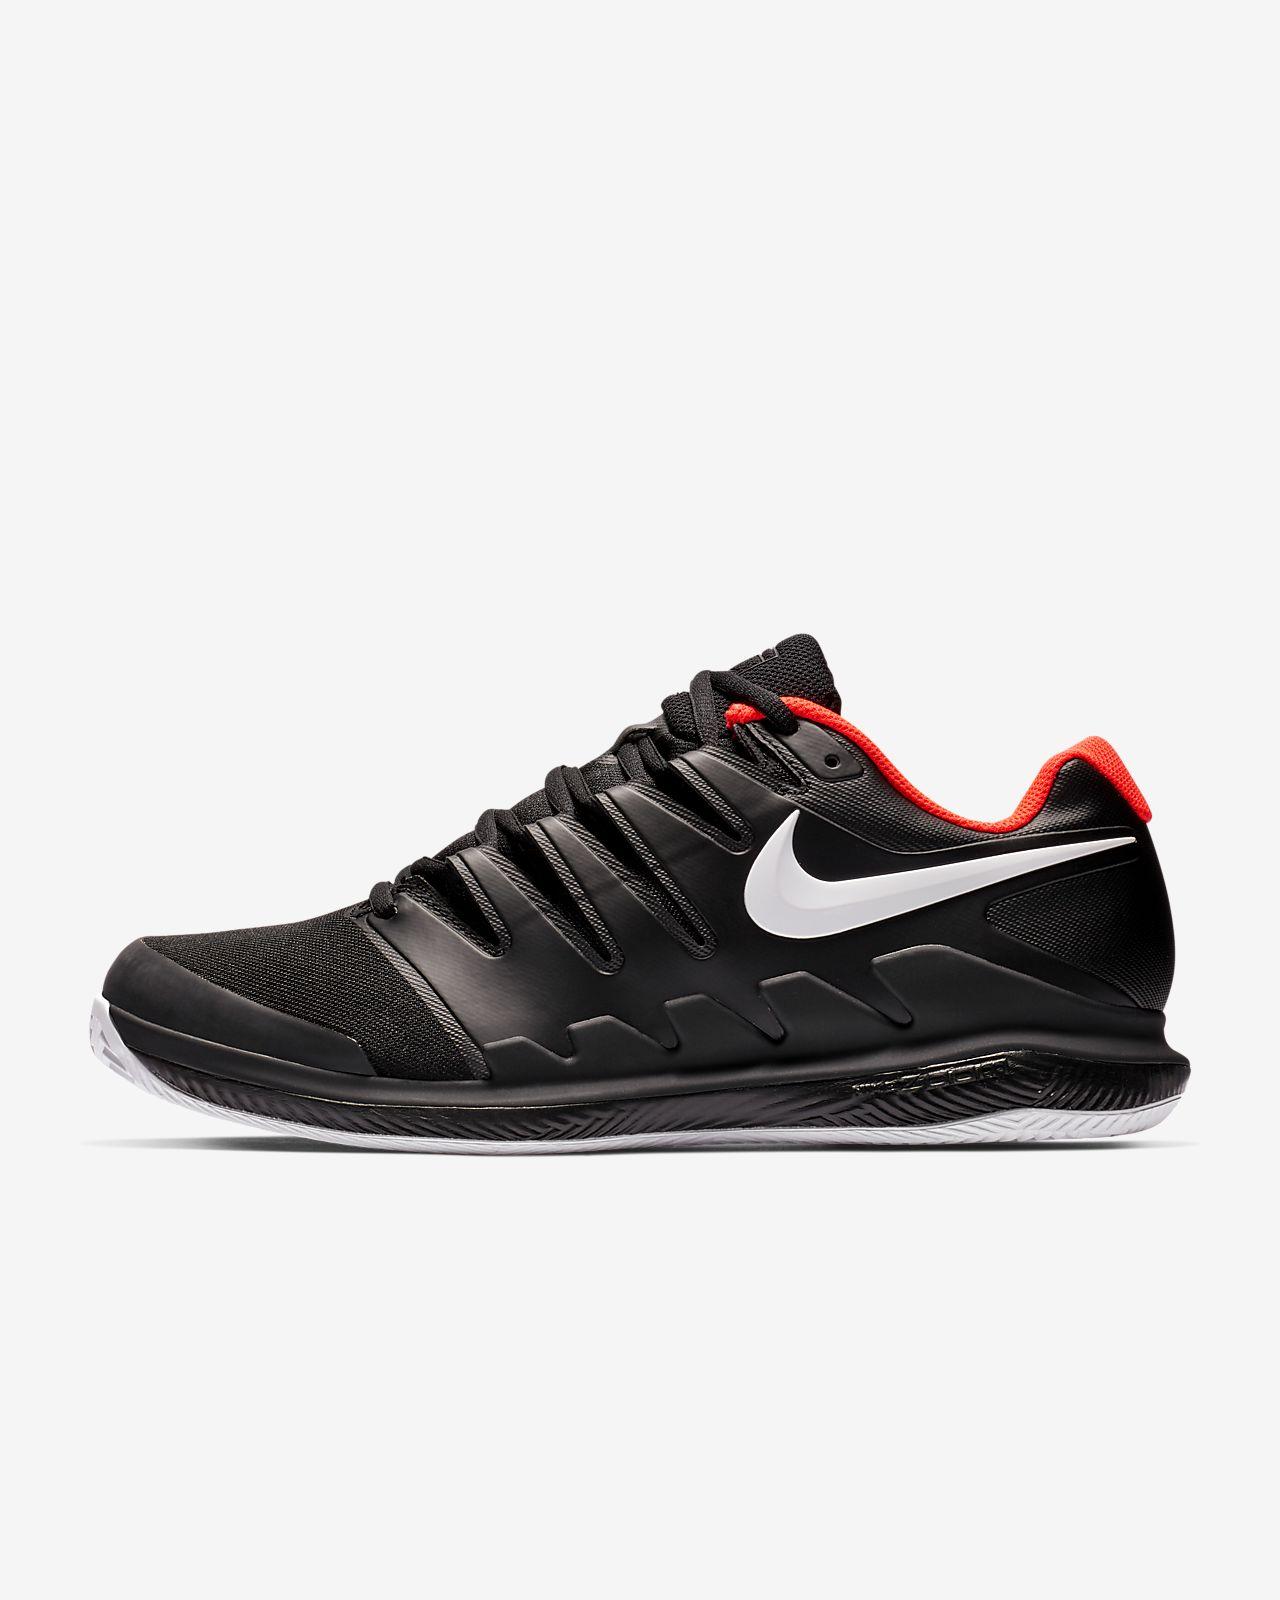 Scarpa da tennis per campi in terra rossa NikeCourt Air Zoom Vapor X - Uomo